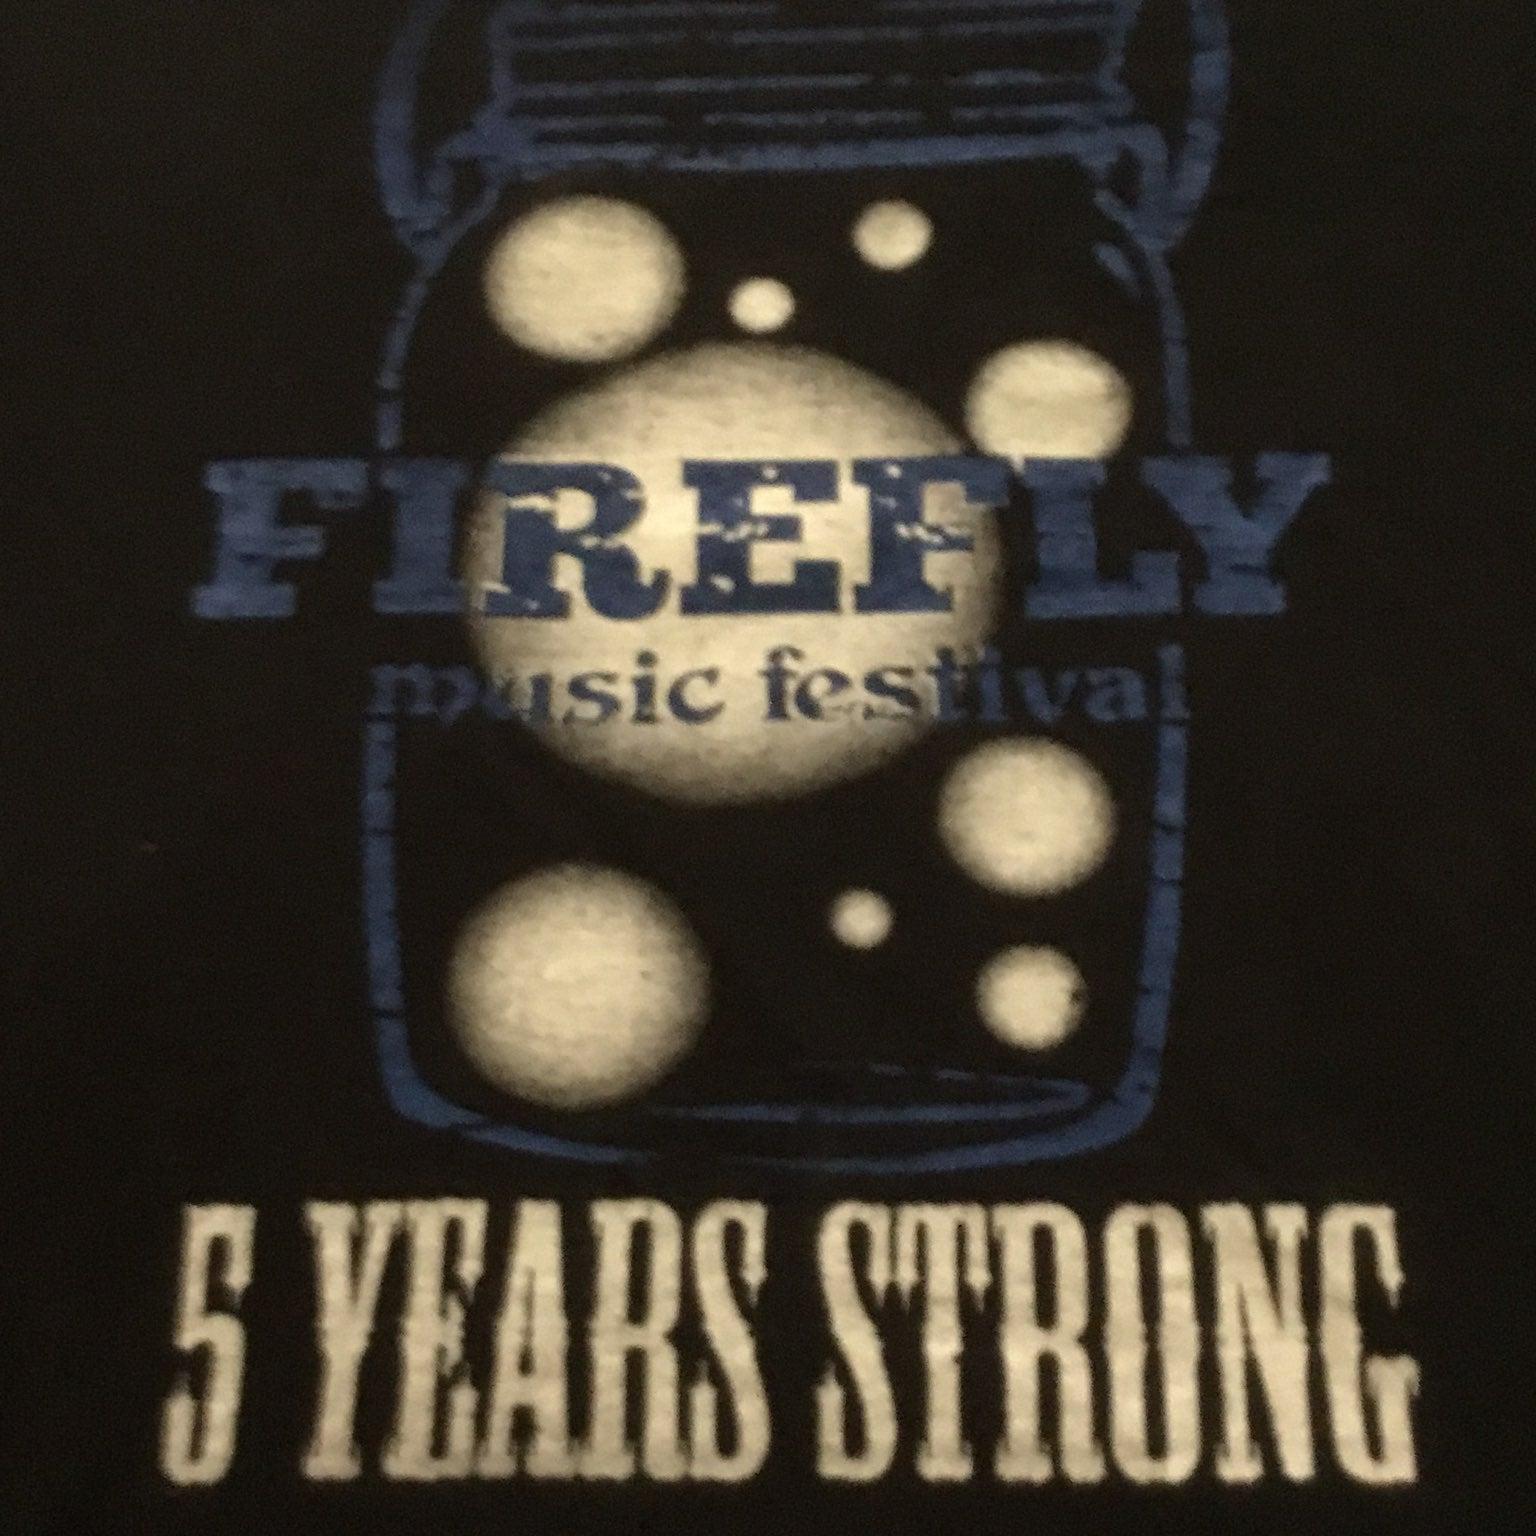 Firefly music festival tshirt